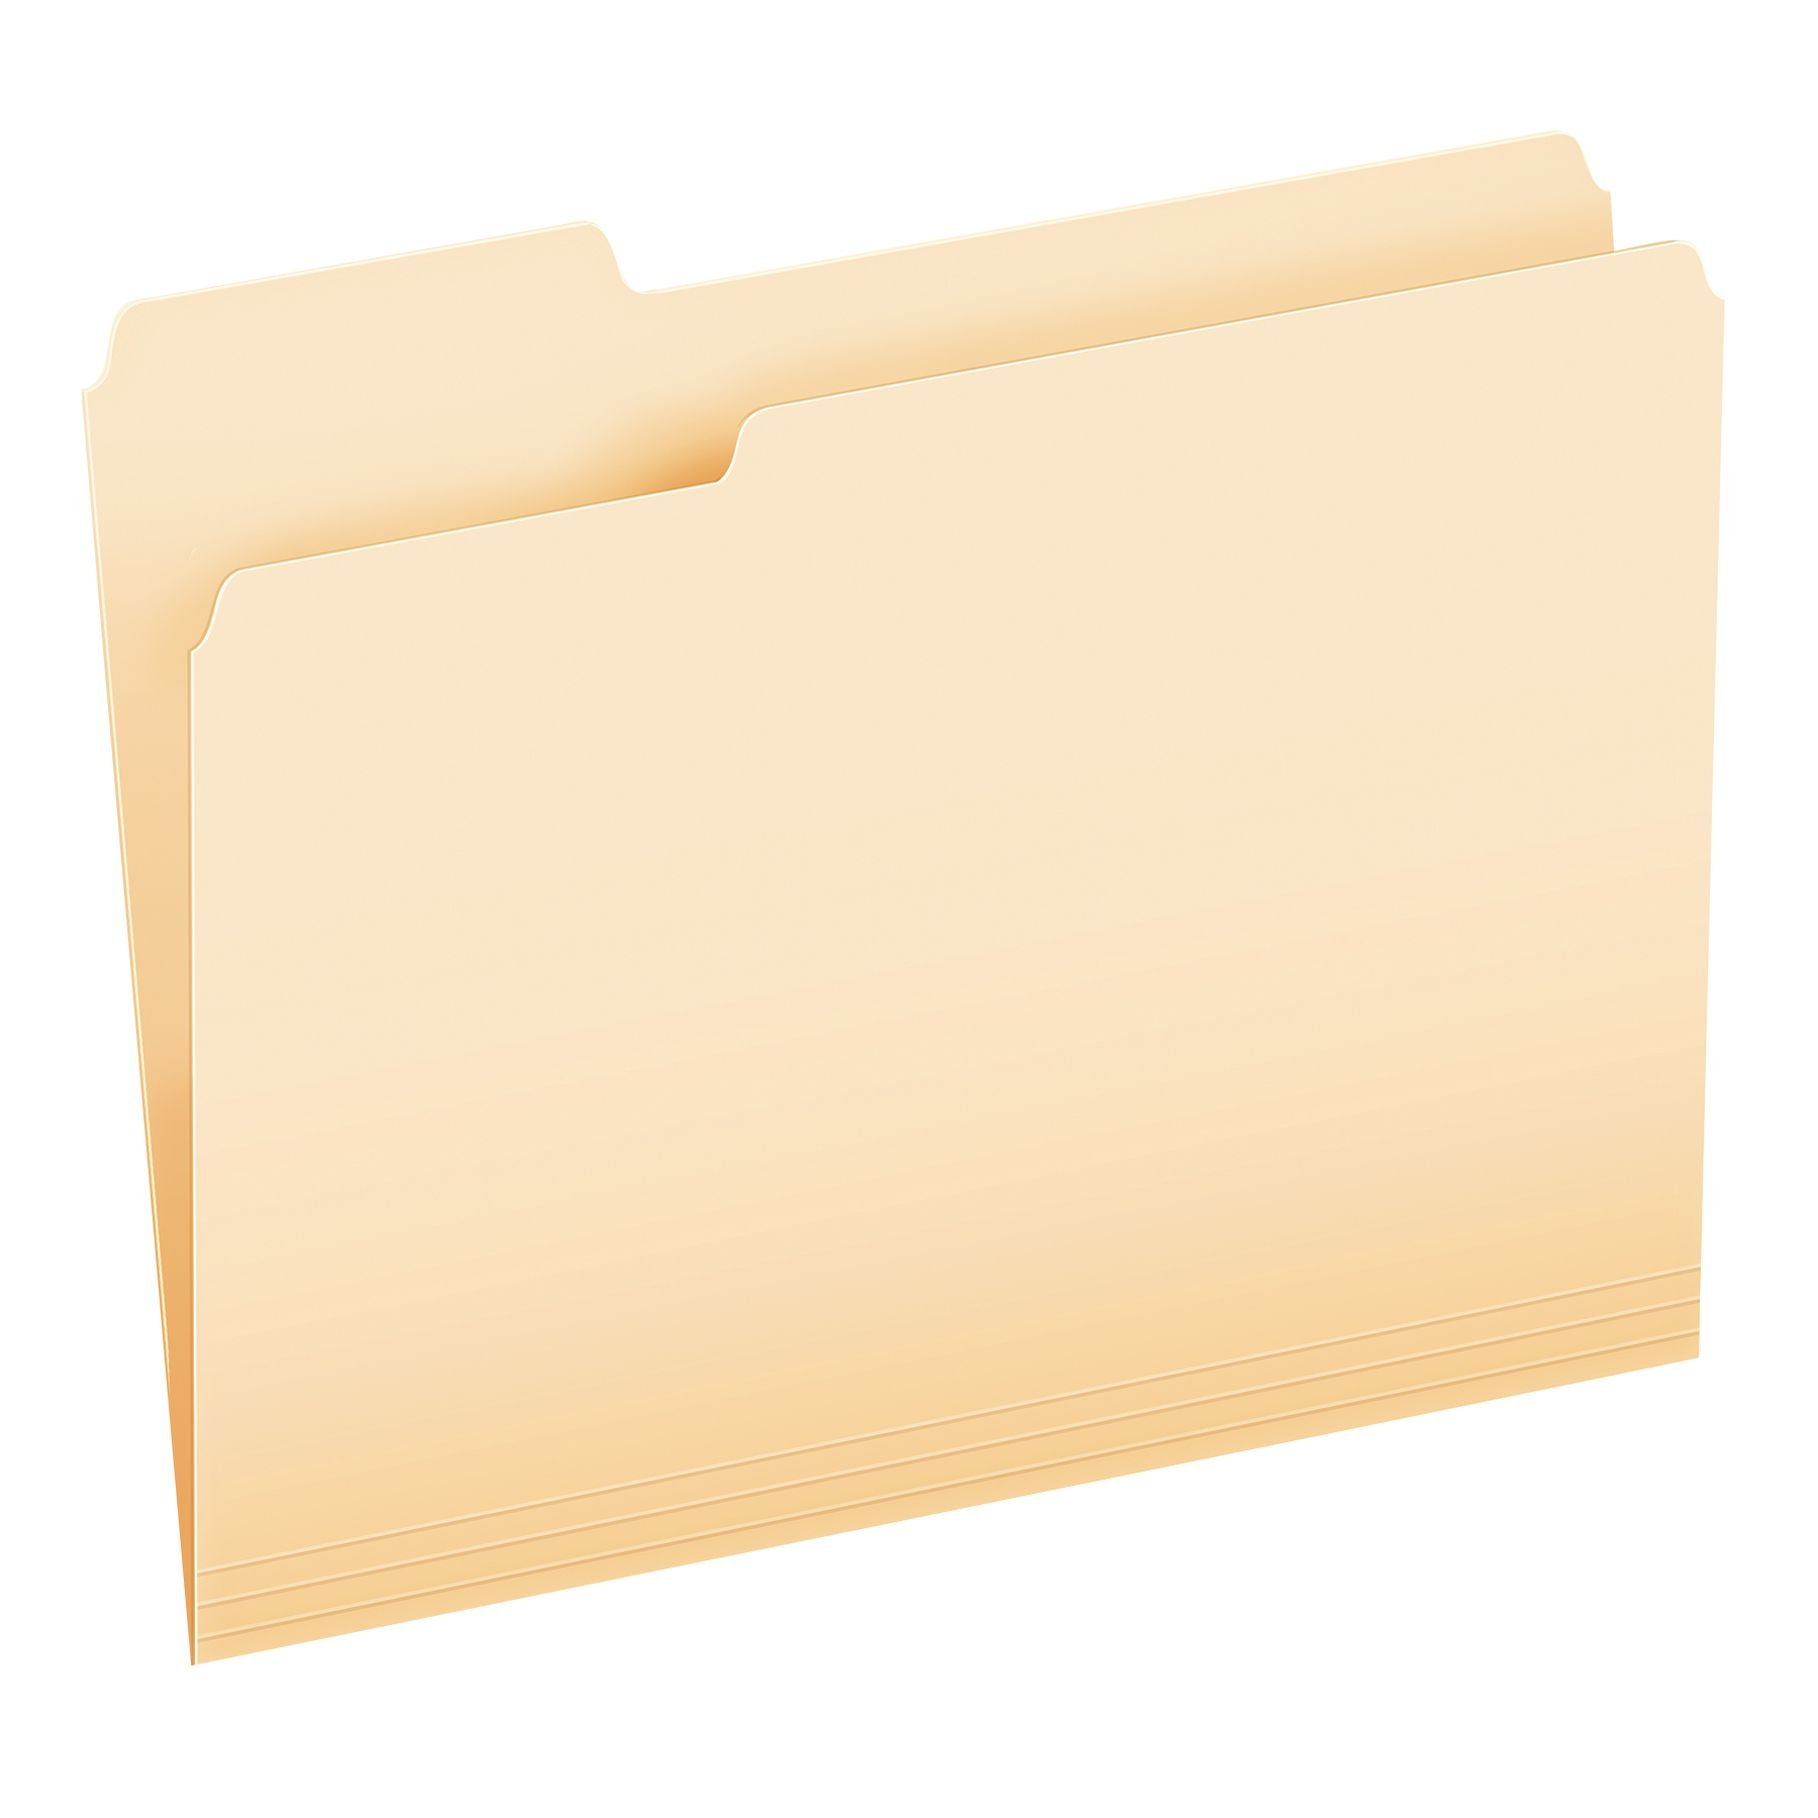 Pendaflex Essentials File Folders, Letter Size, 1/3 Cut, Manila, 250 per Box (752250)